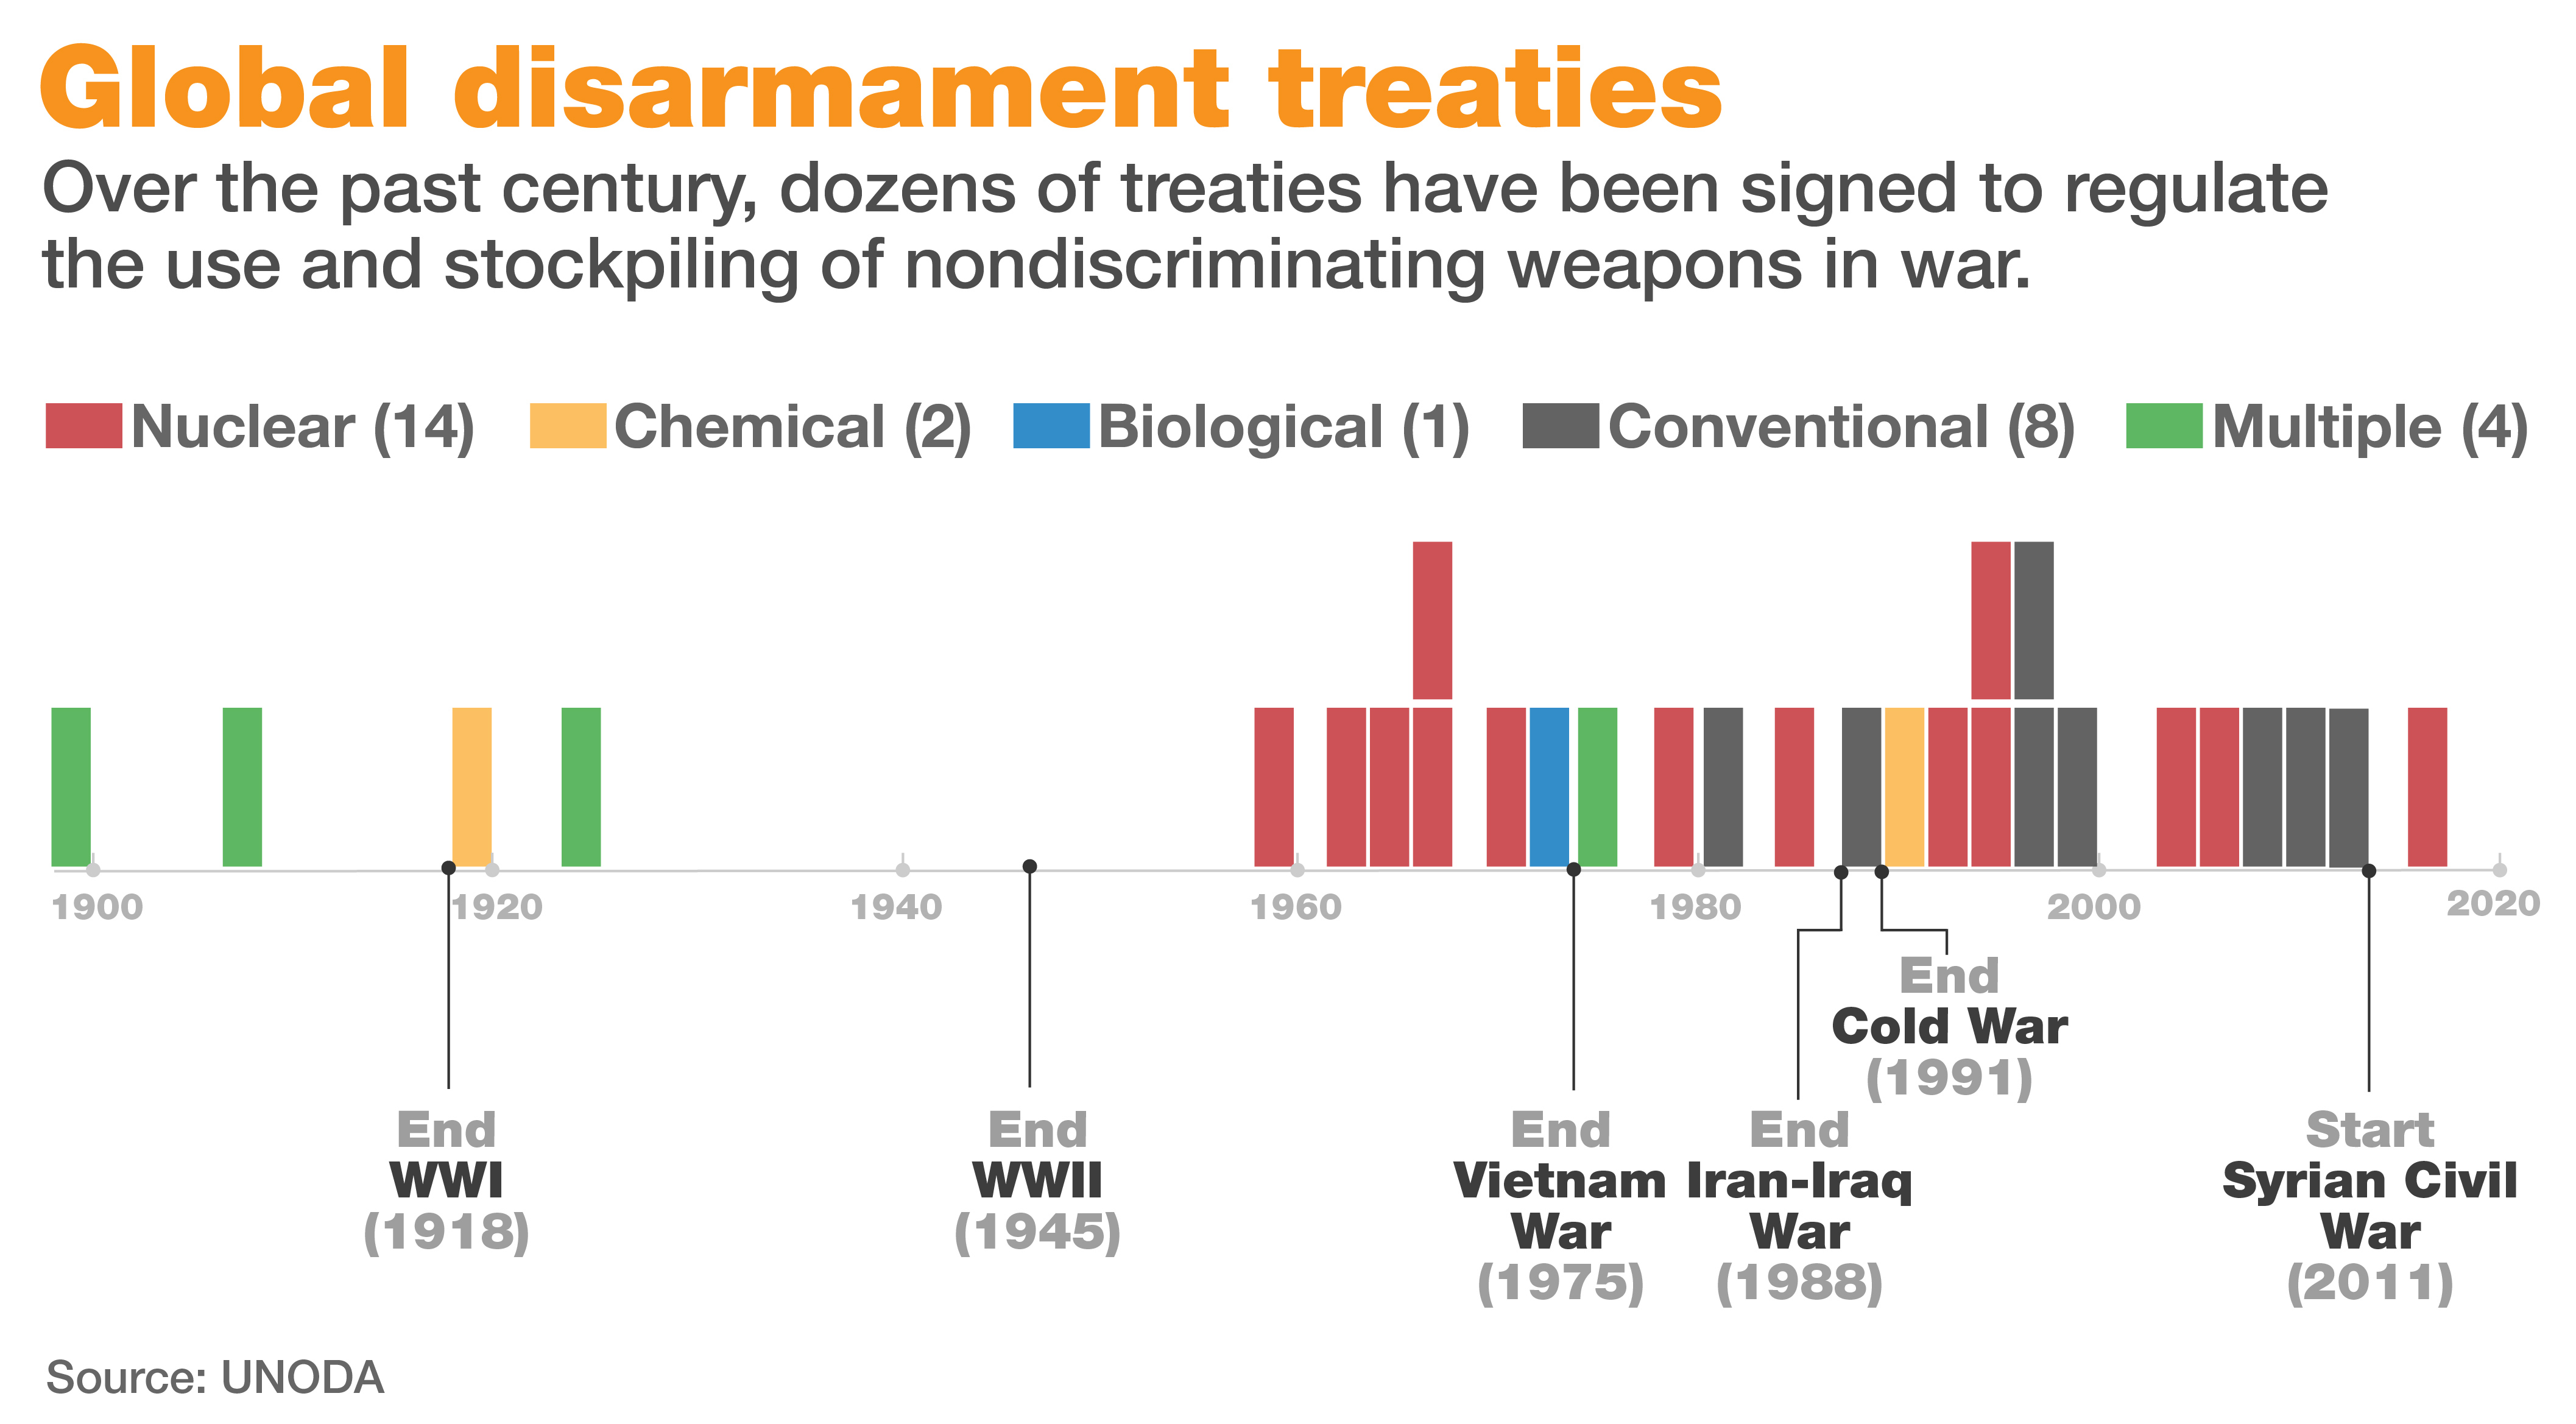 Global disarmament treaties